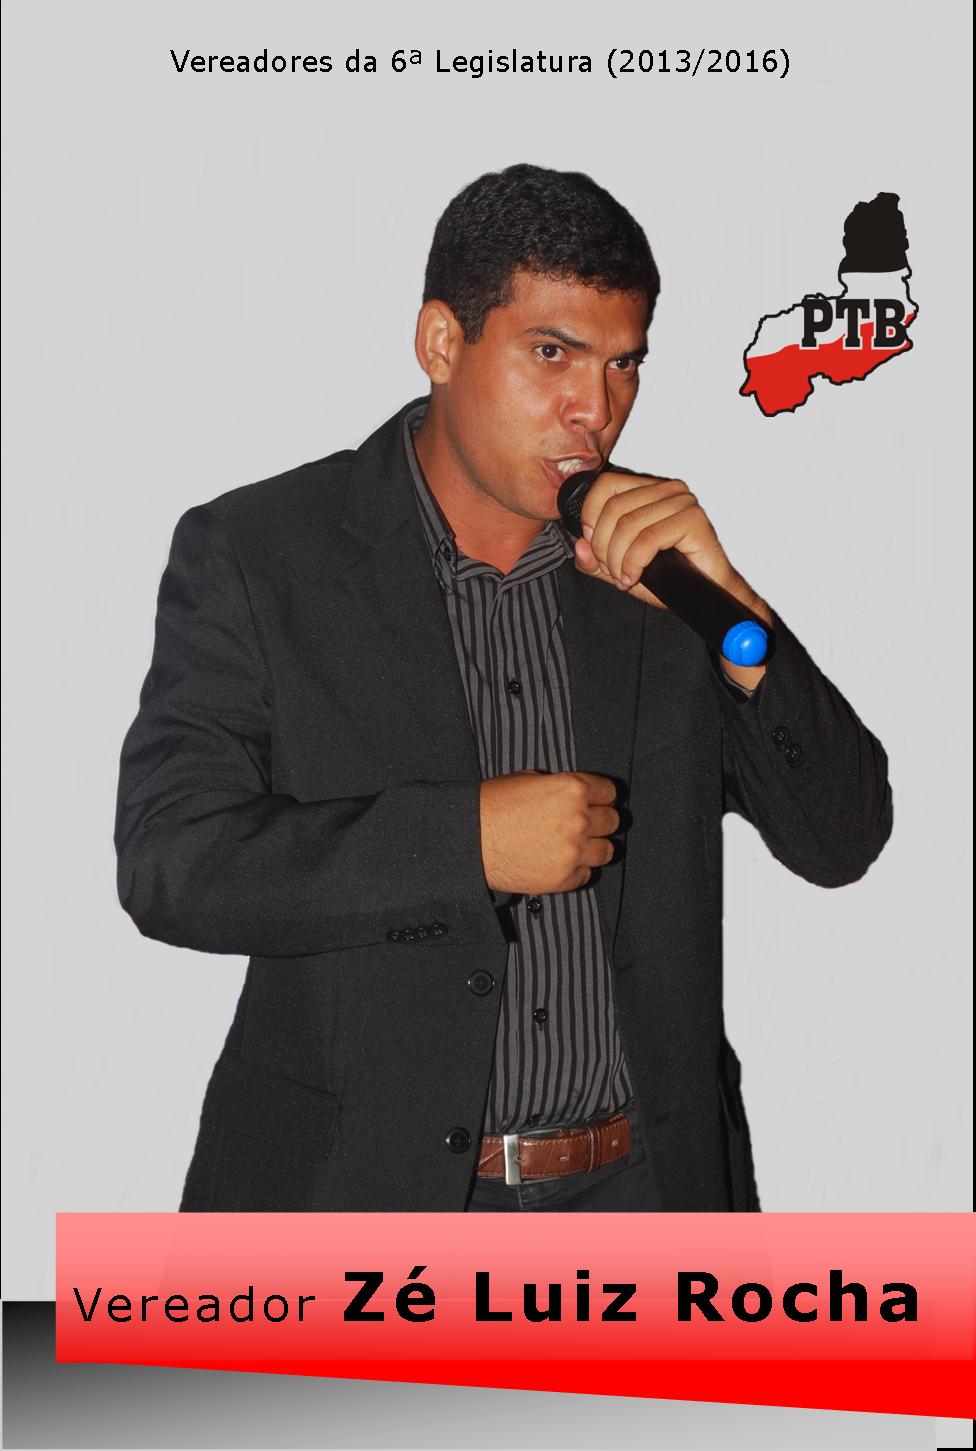 José Luiz Sousa